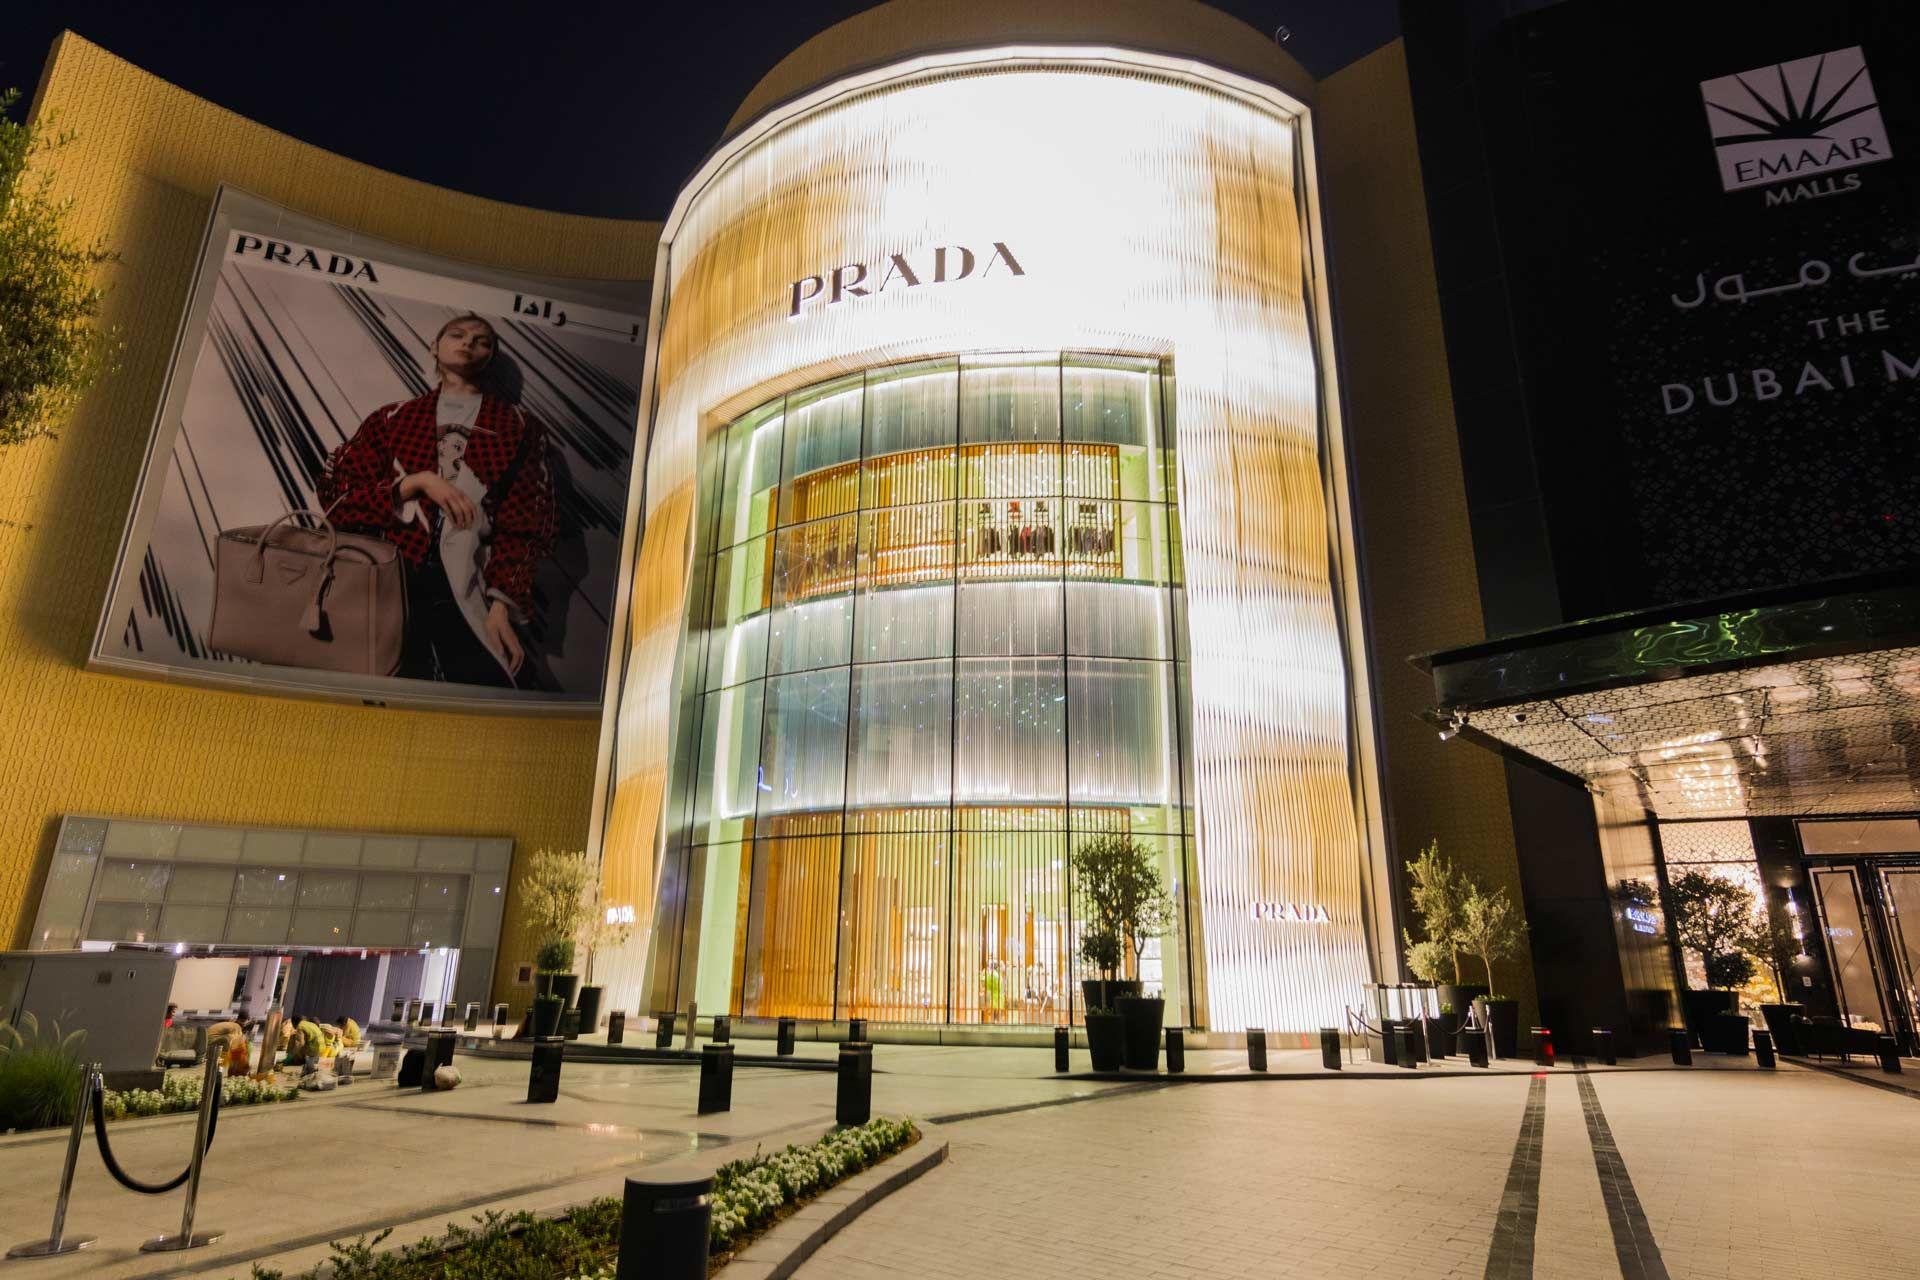 Prada at Dubai Mall